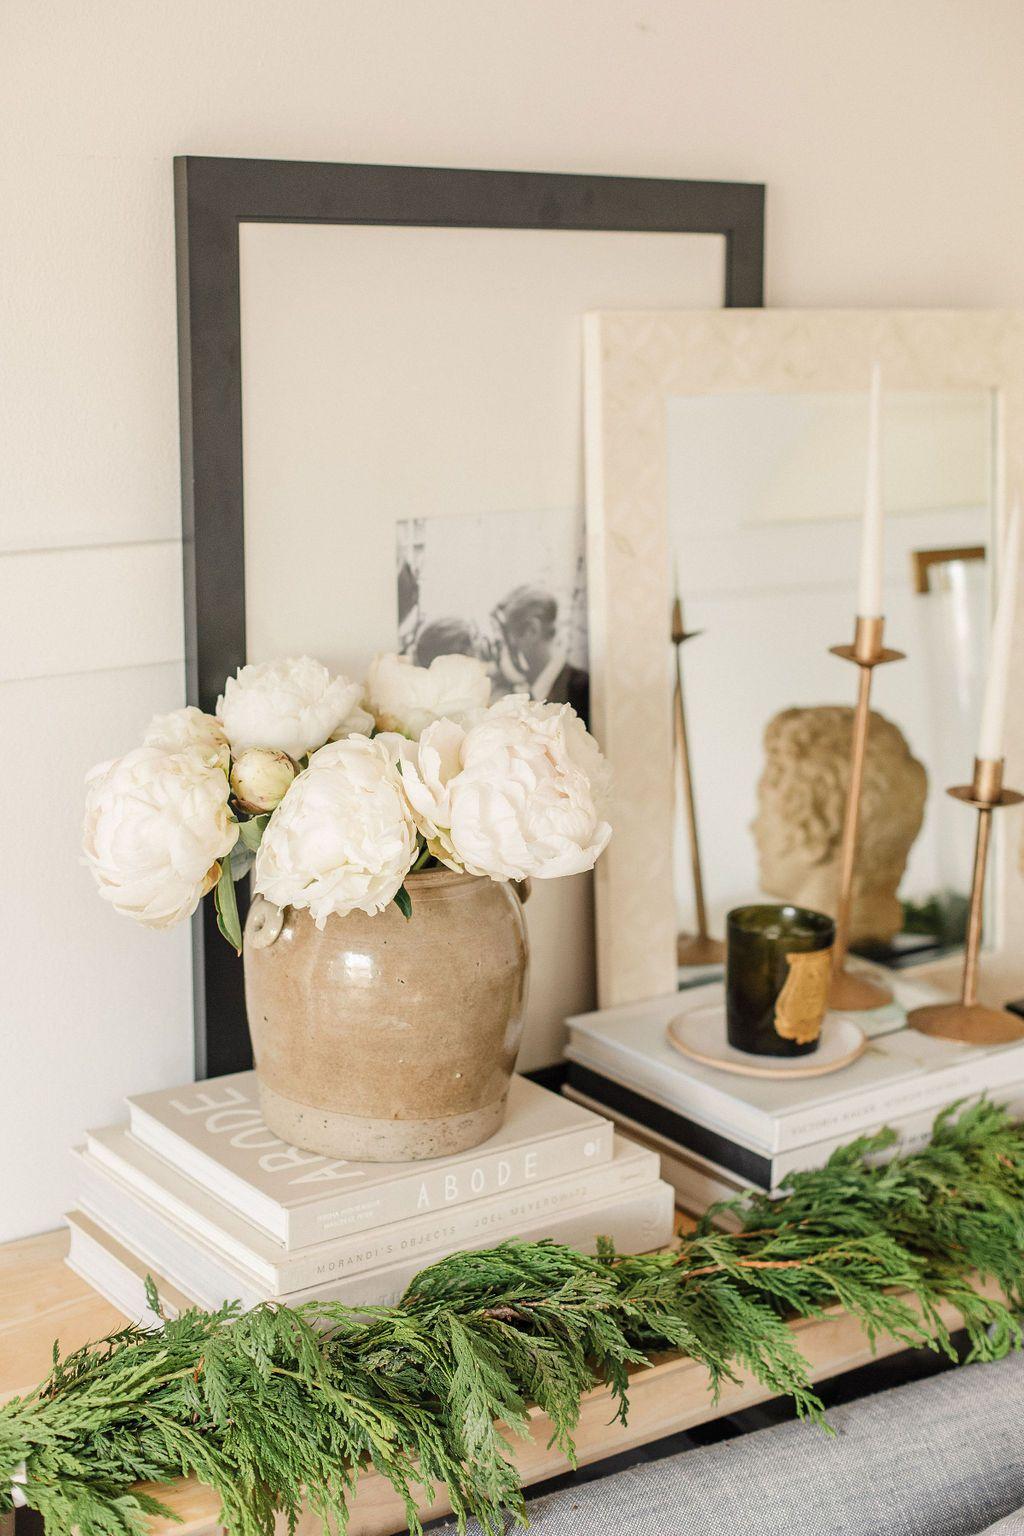 Simple Seasonal Decorating Seasonal Decor Natural Home Decor Decor